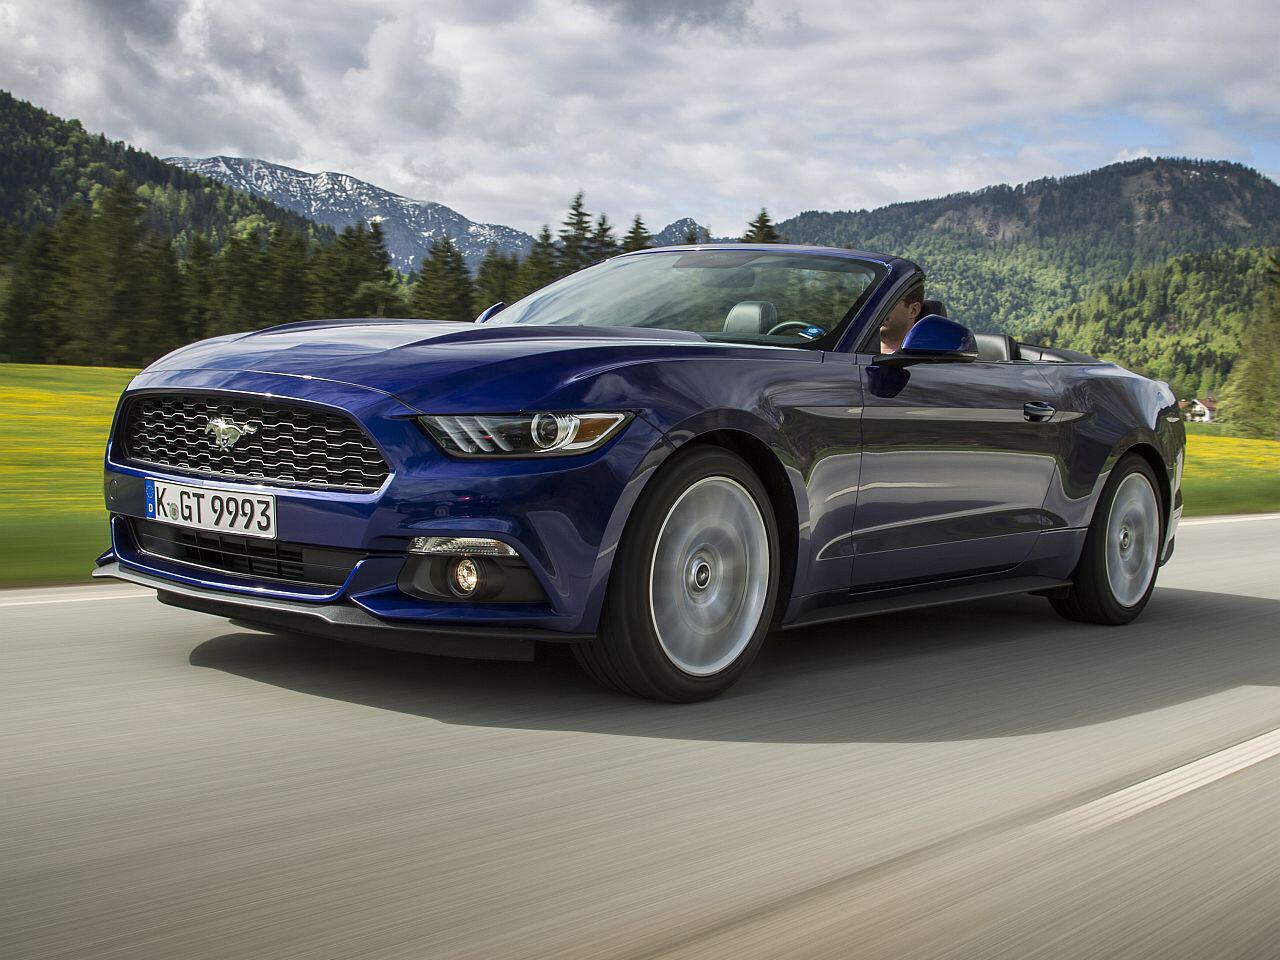 Bild zu Ford Mustang Cabriolet